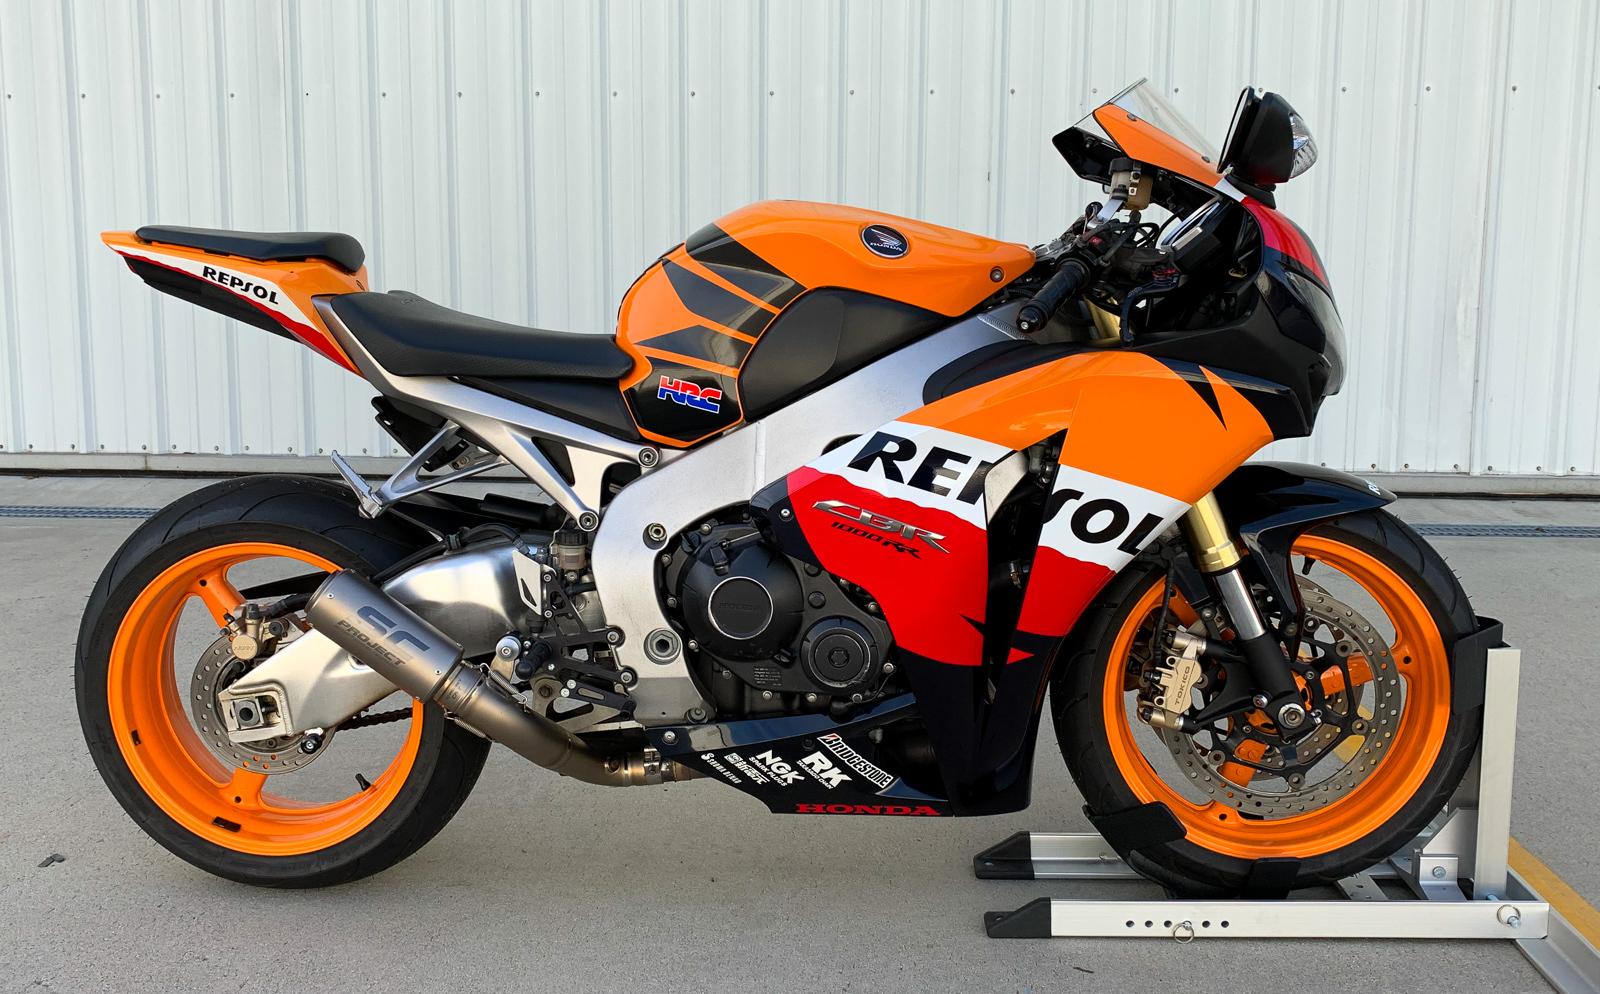 2009 Honda Cbr1000rr Repsol Iconic Motorbike Auctions